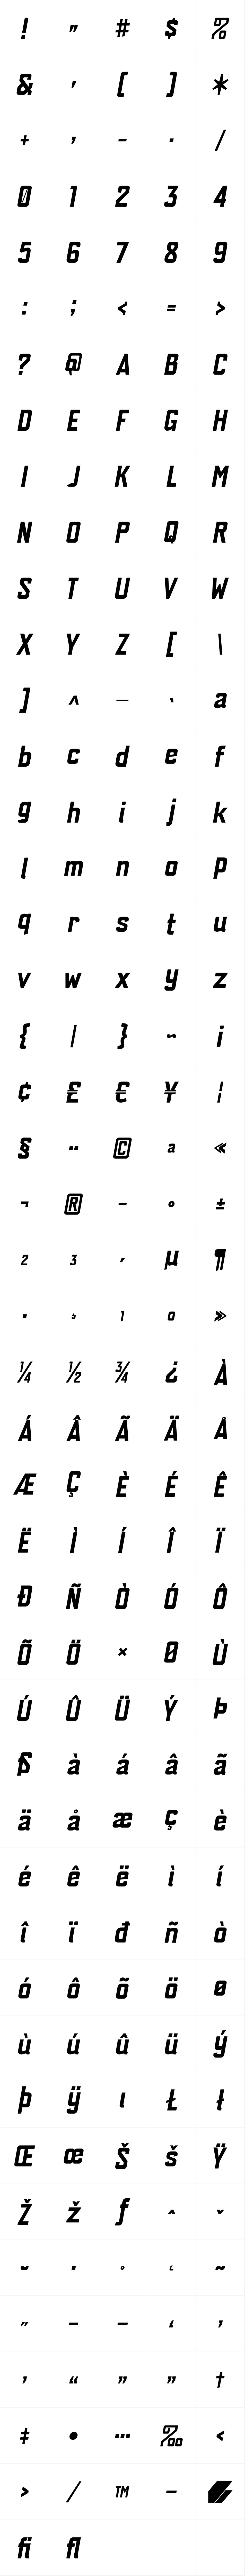 Paggio Nuovo Medium Italic